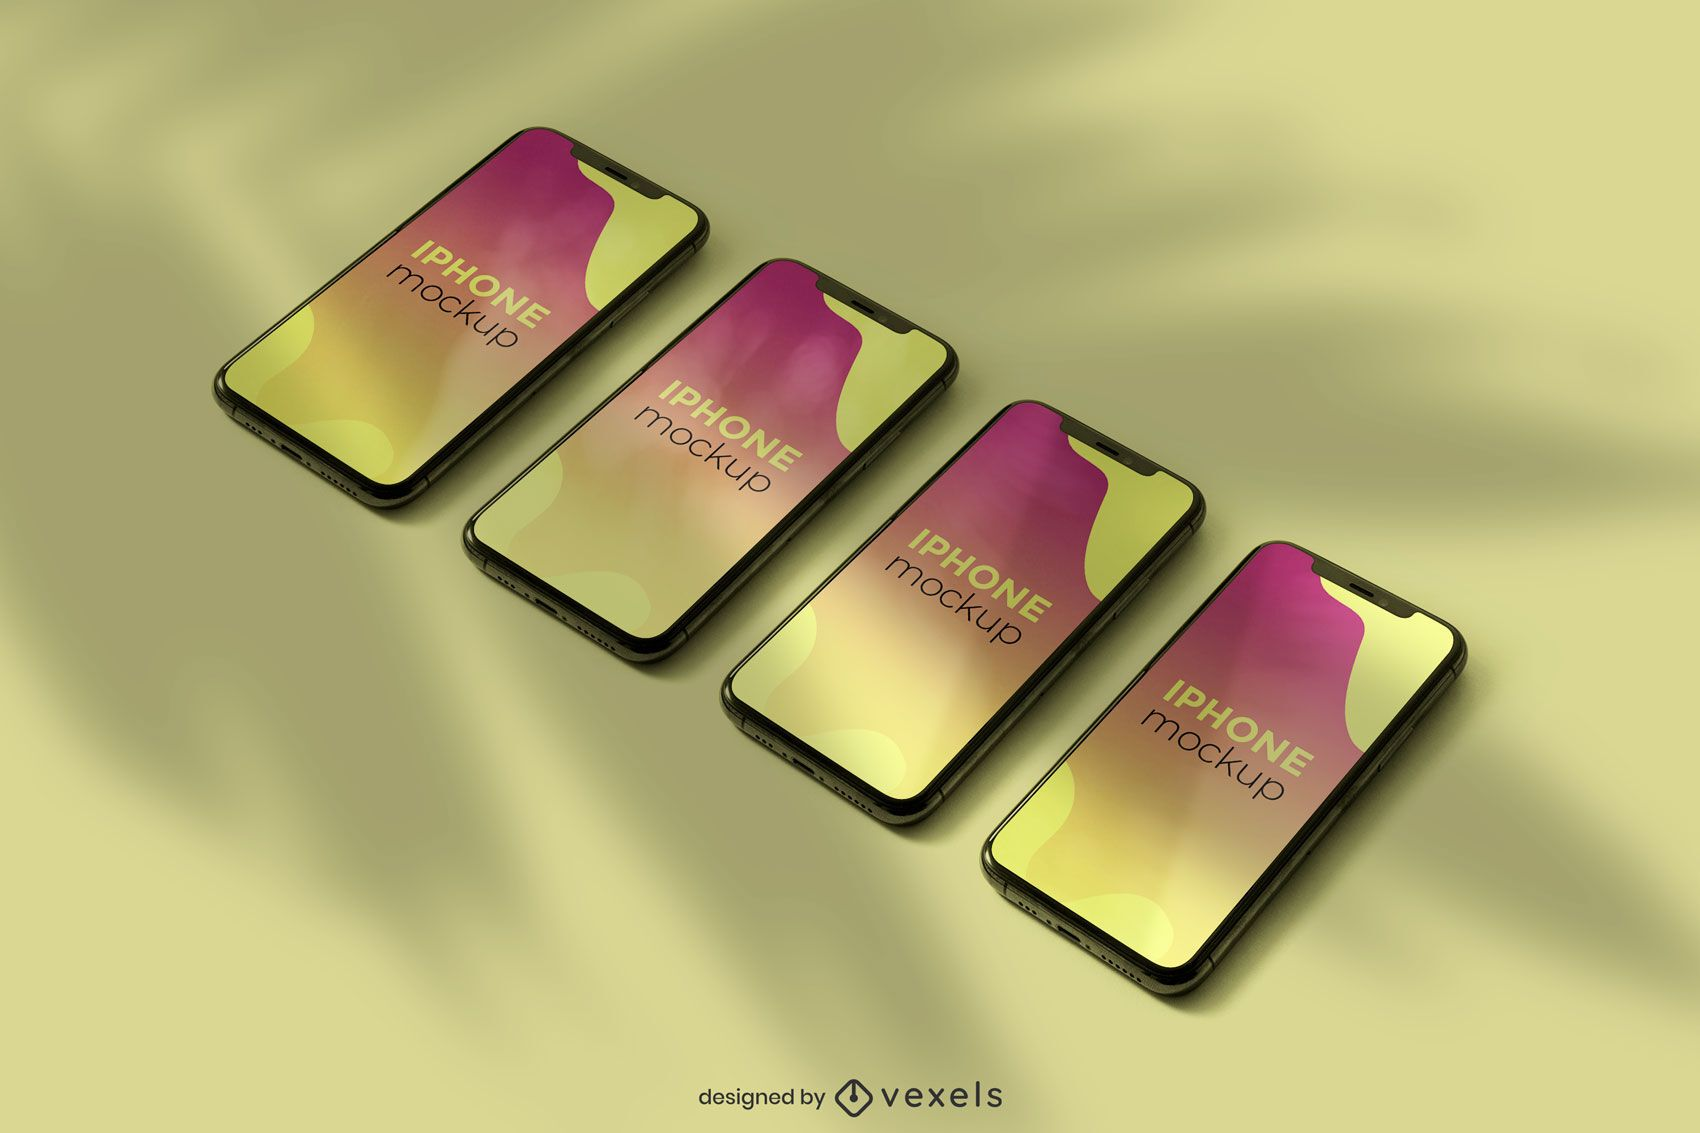 Iphones mockup design set